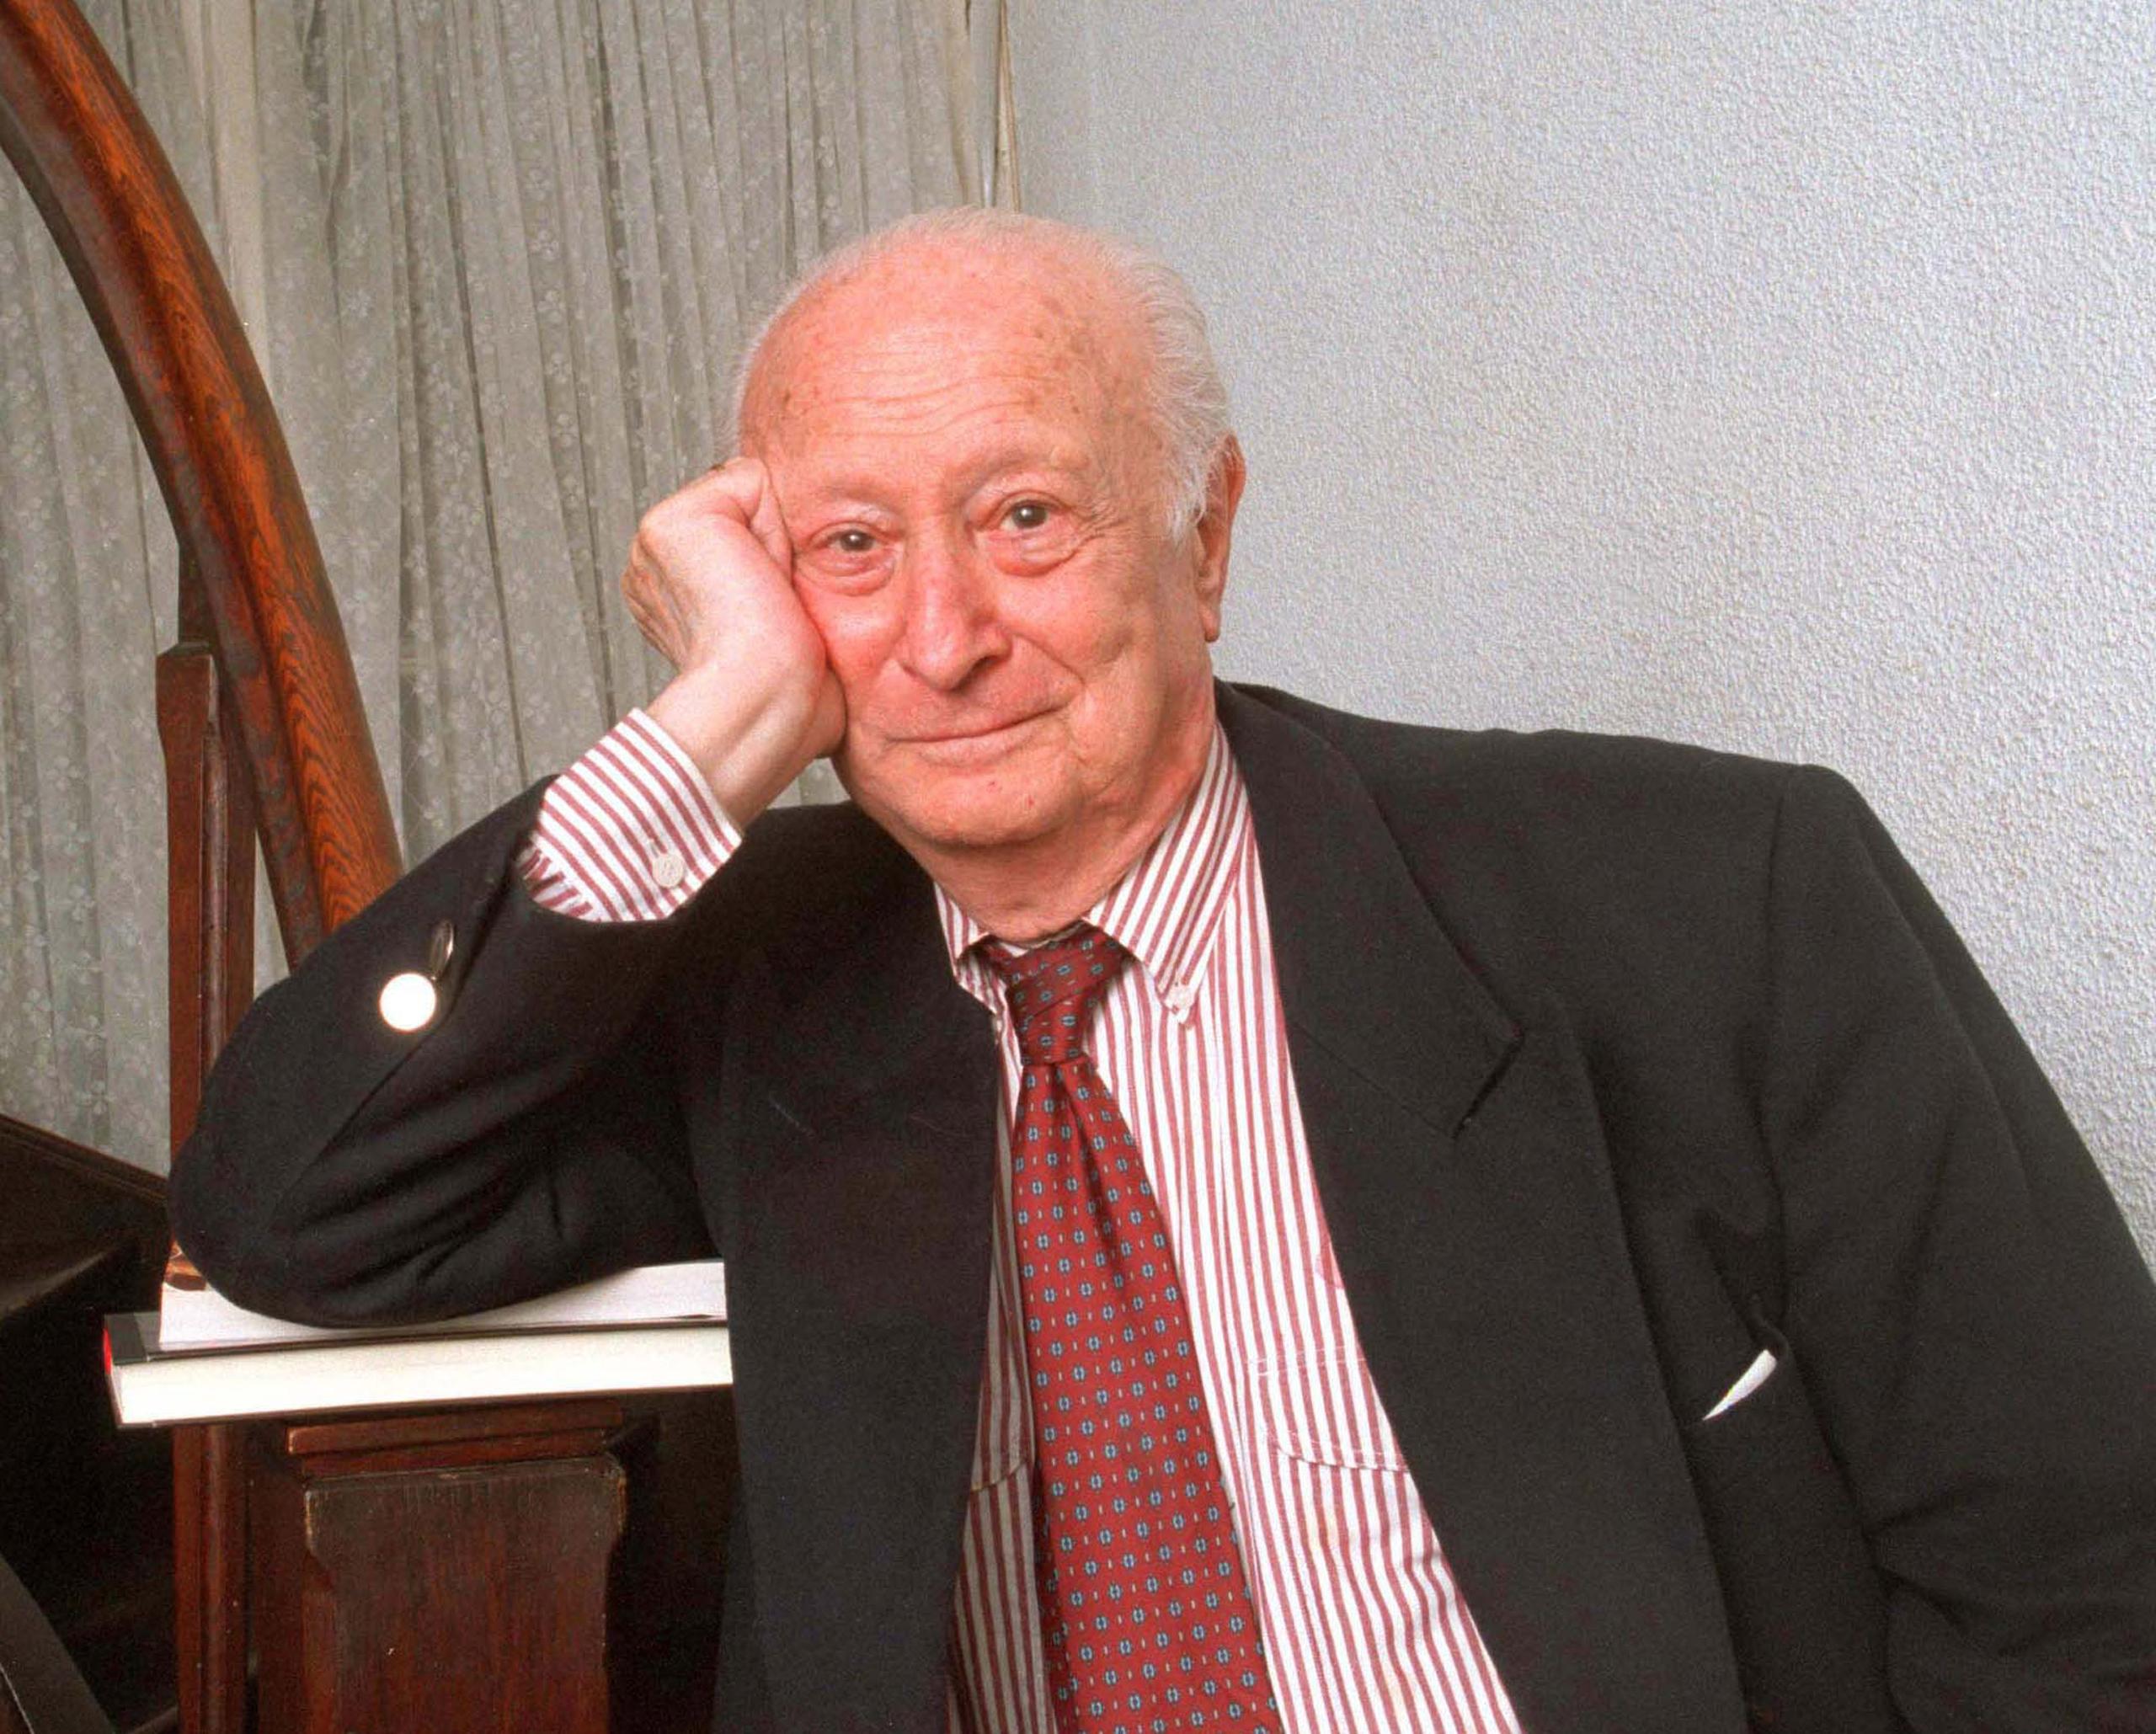 Wladislaw Szpilman.